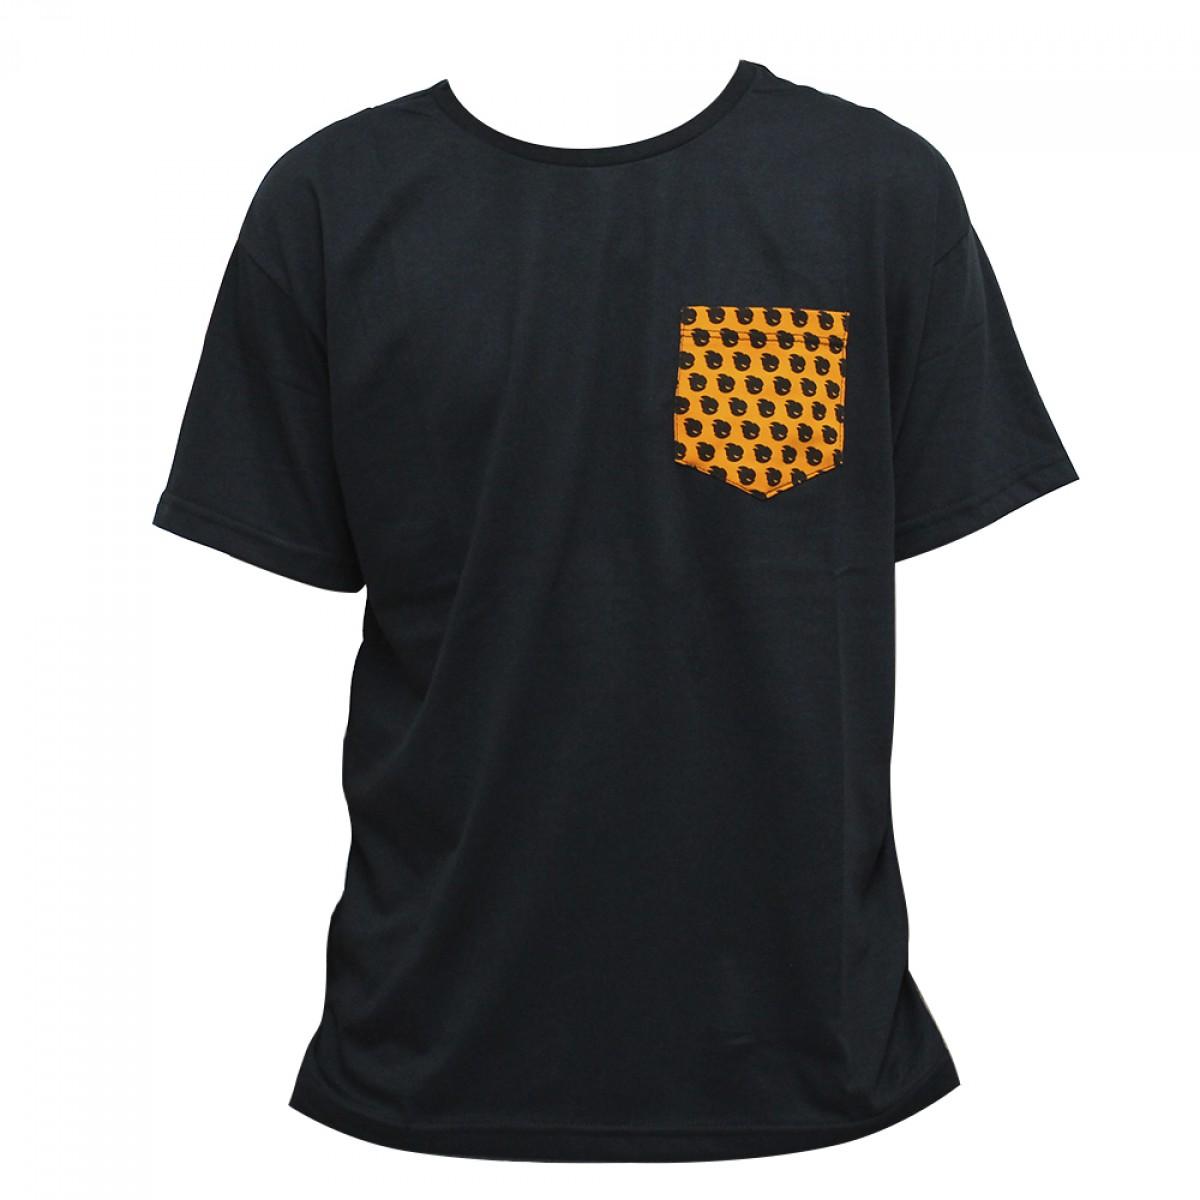 Camiseta Terabyteshop, Unisex, Manga Curta, Algodão, Preto e Laranja, Bolso (M)